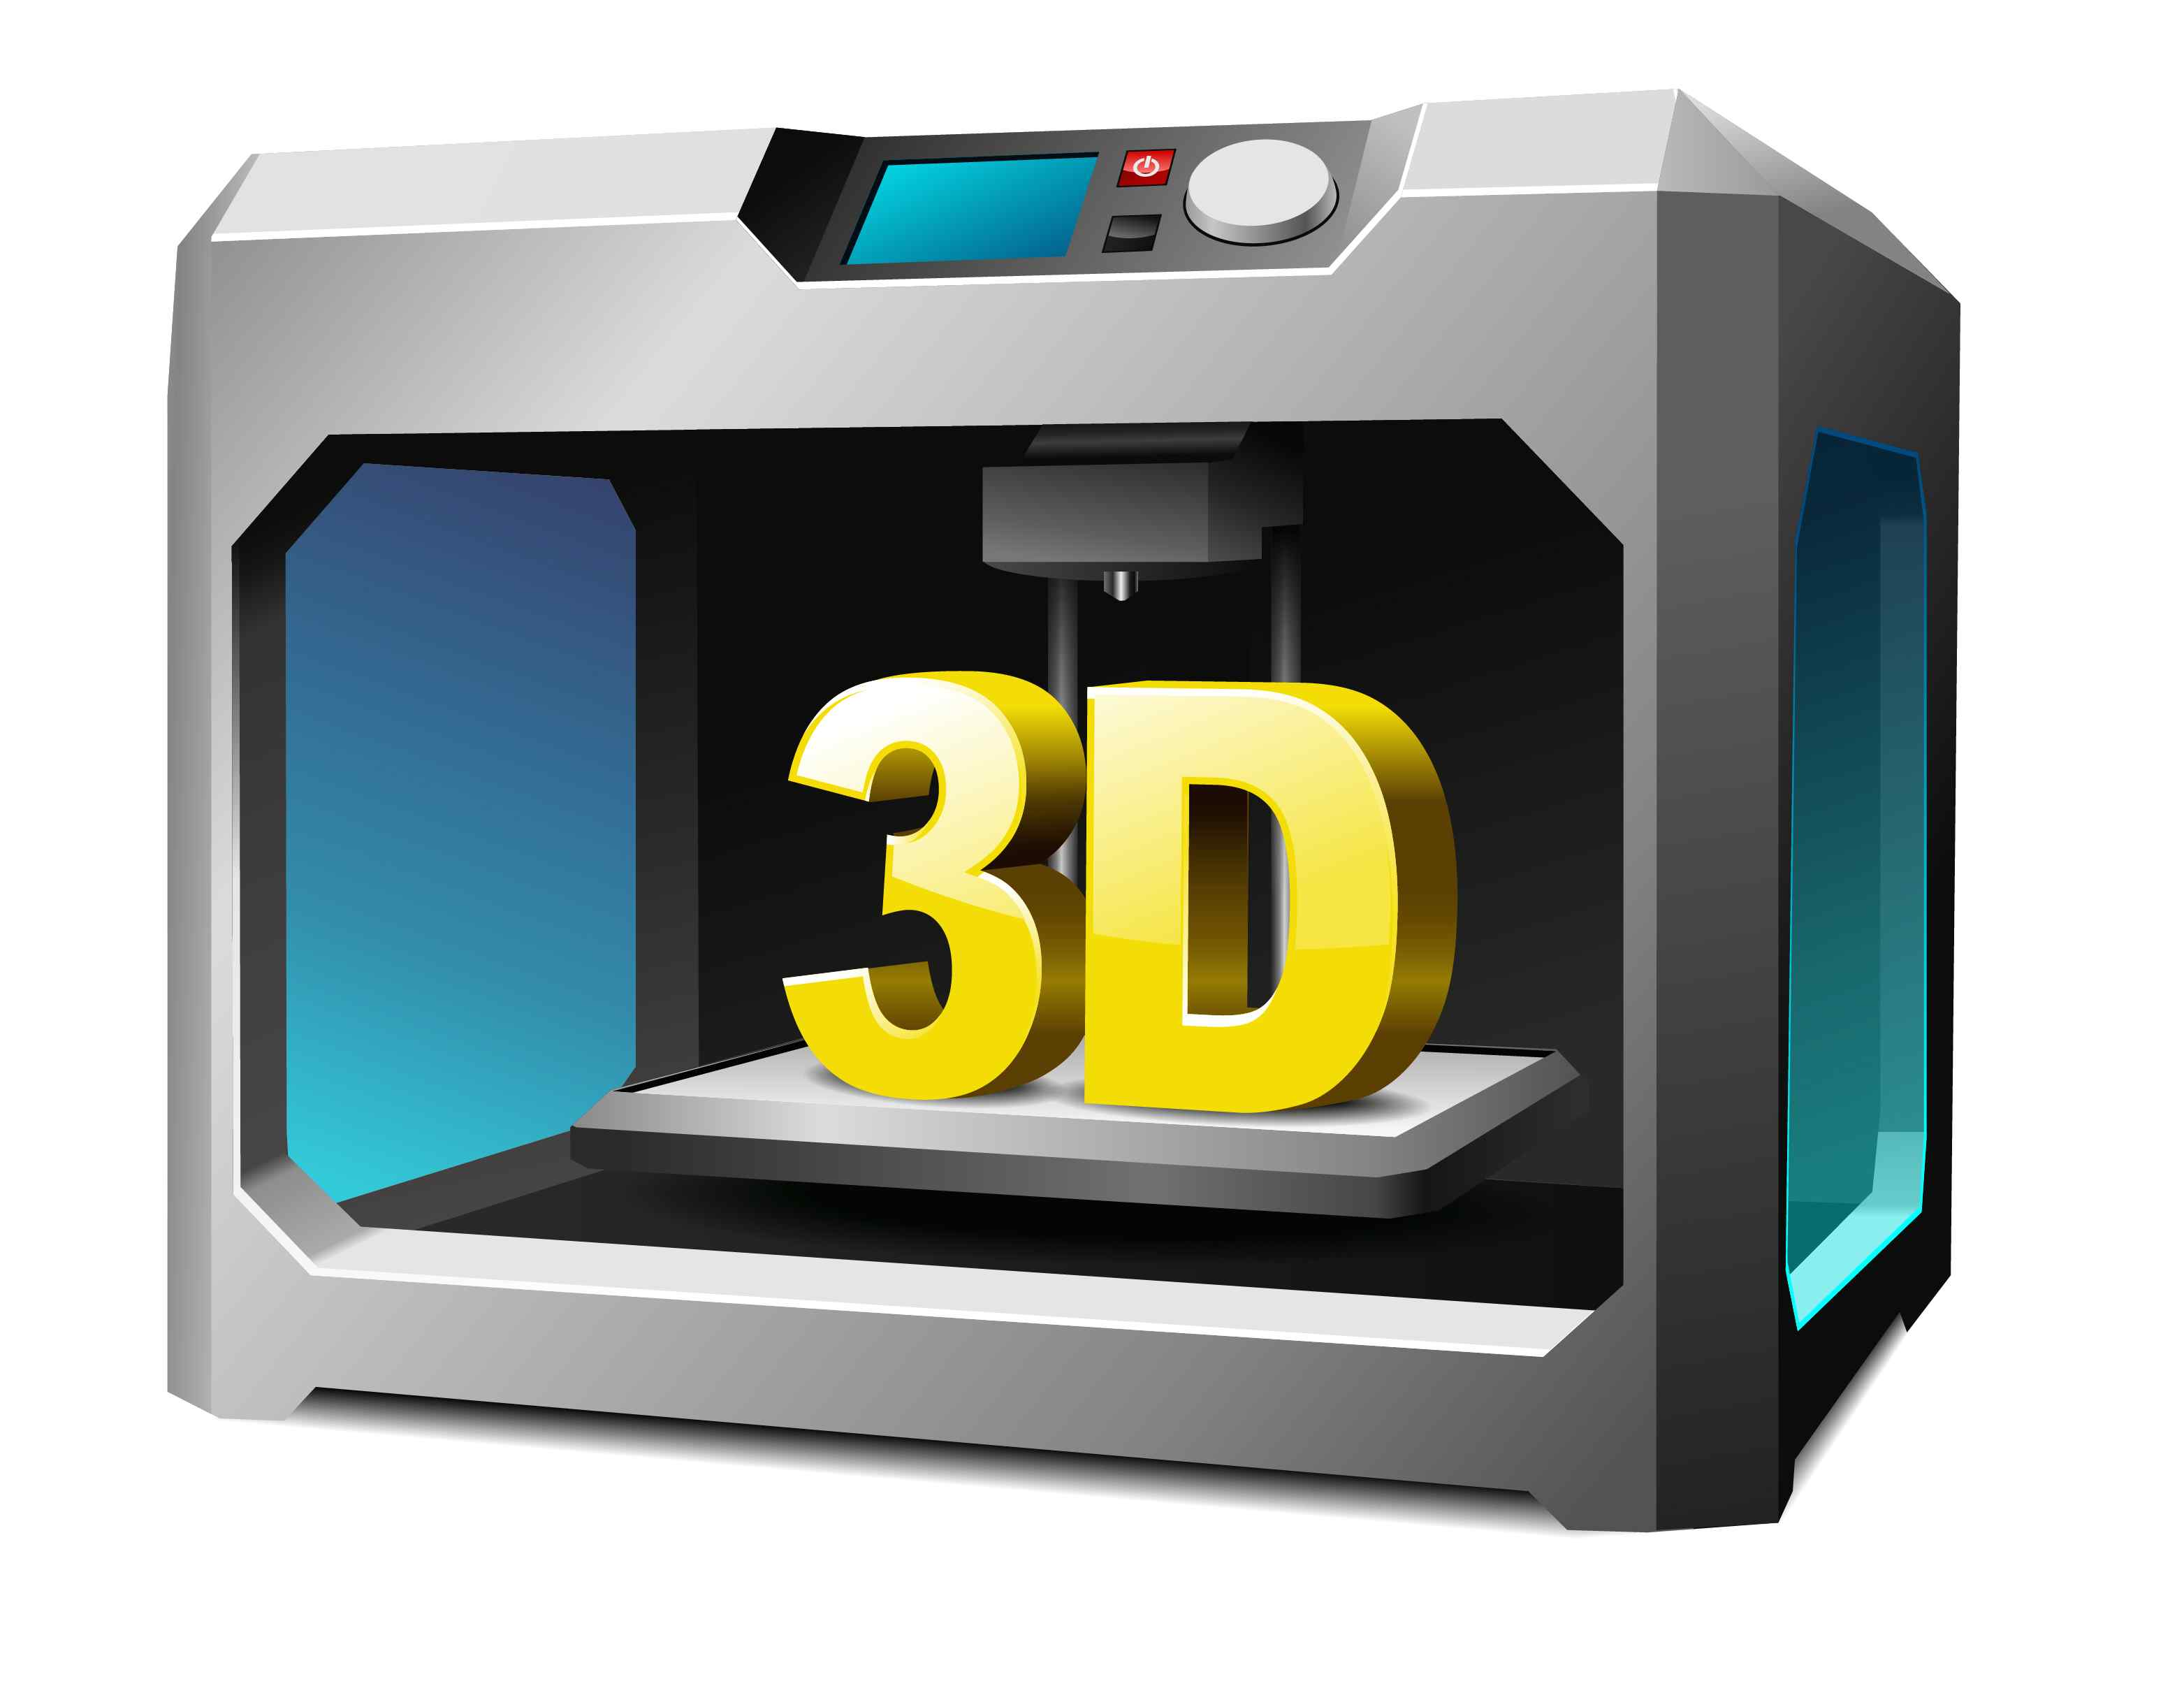 3d printing mfg